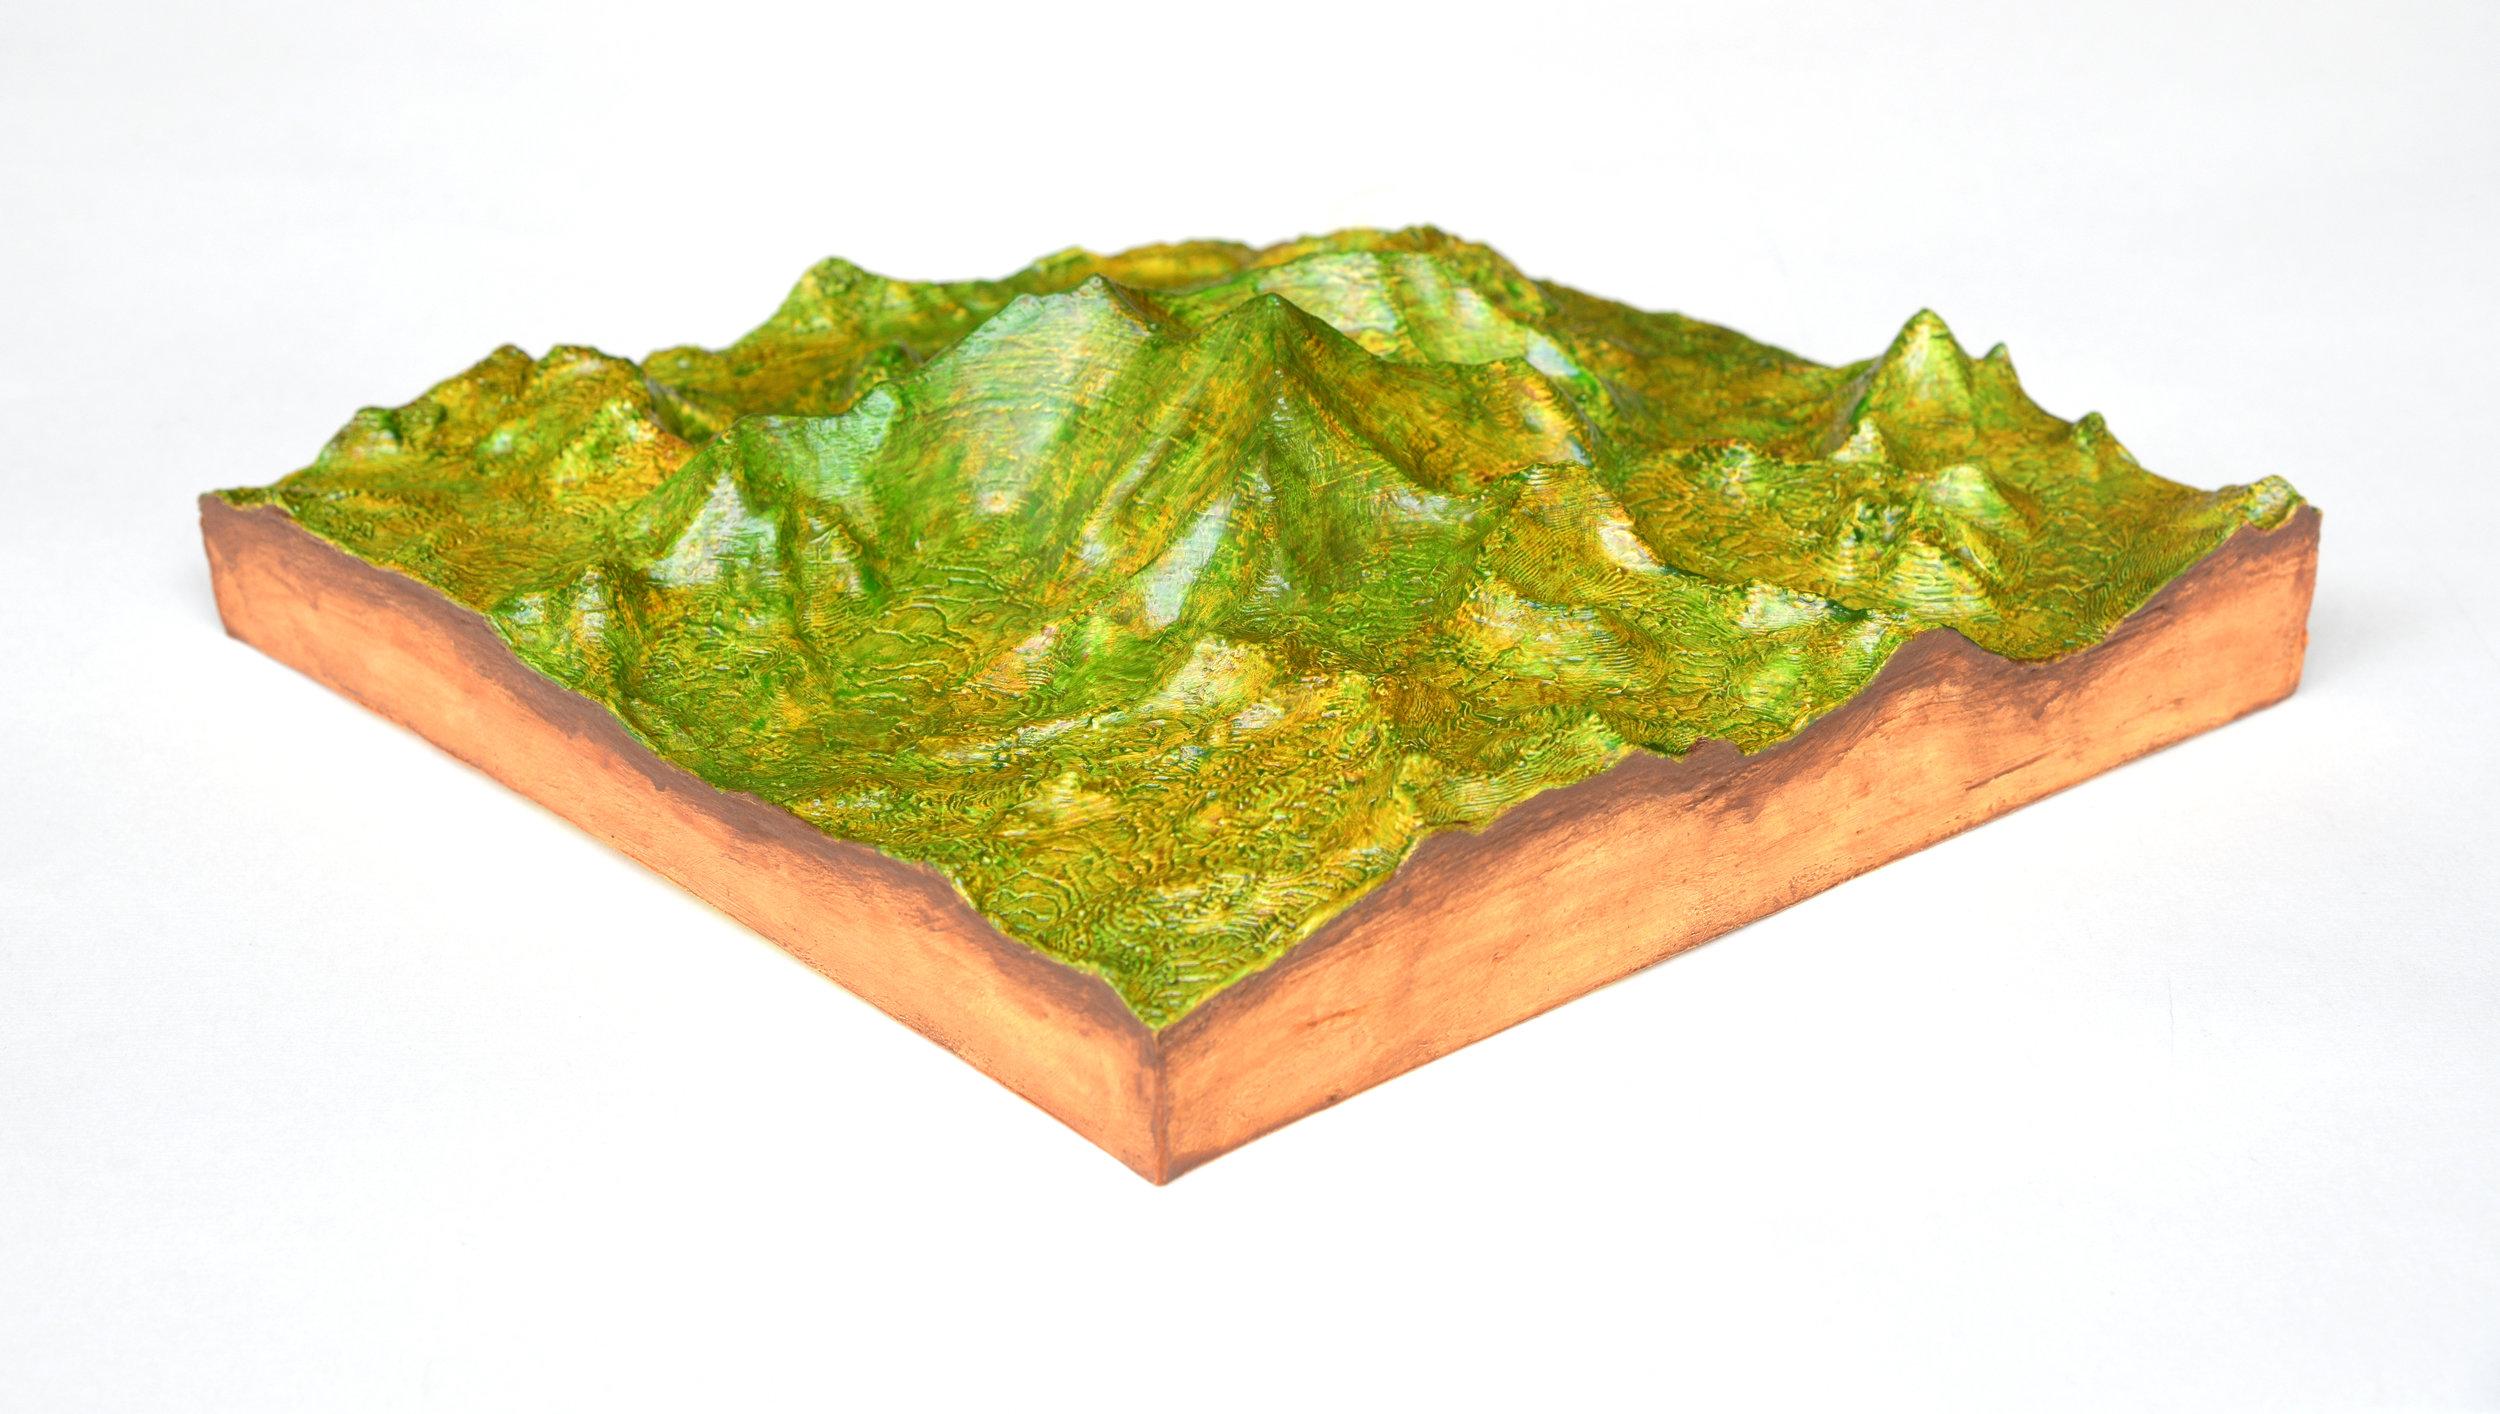 S.T, de la serie Érase un lugar (2019) - 6 x 20 x 20 cm - Impresión 3D PLA, resina y pinturas acrílicas  I 3D print on PLA with resine ans acrylic painting